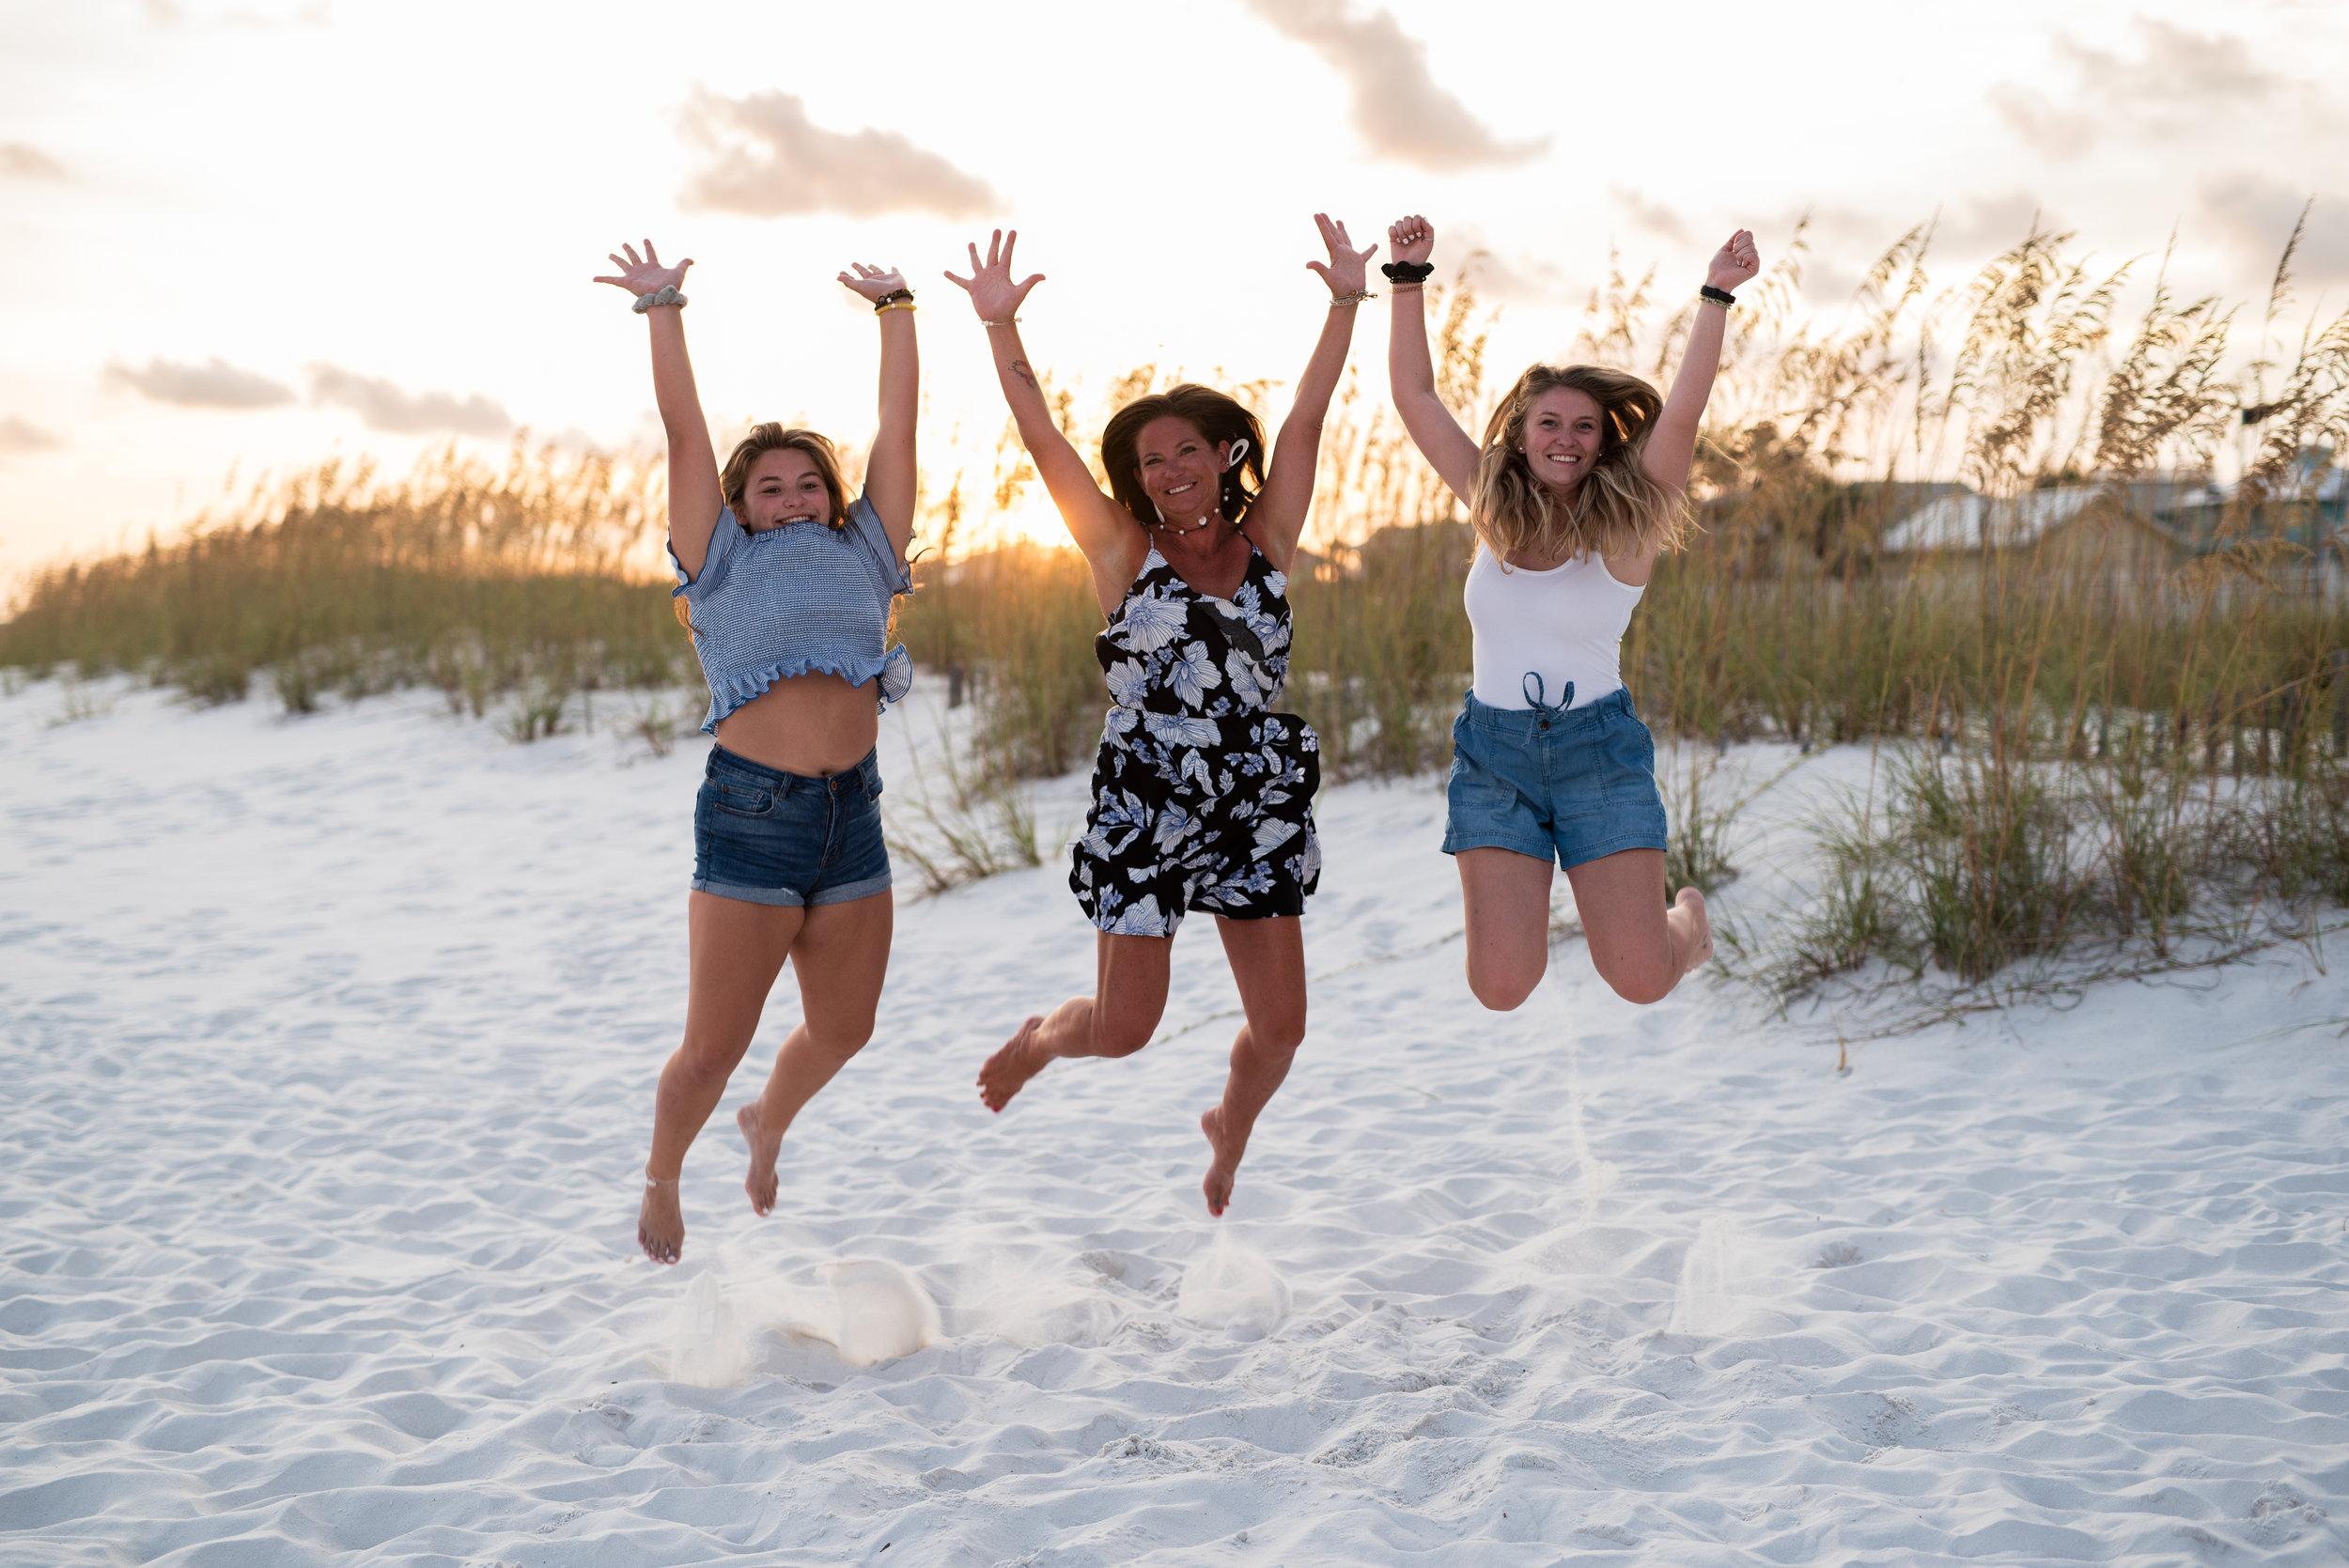 Family Beach Photographer. Kristin Grover Images